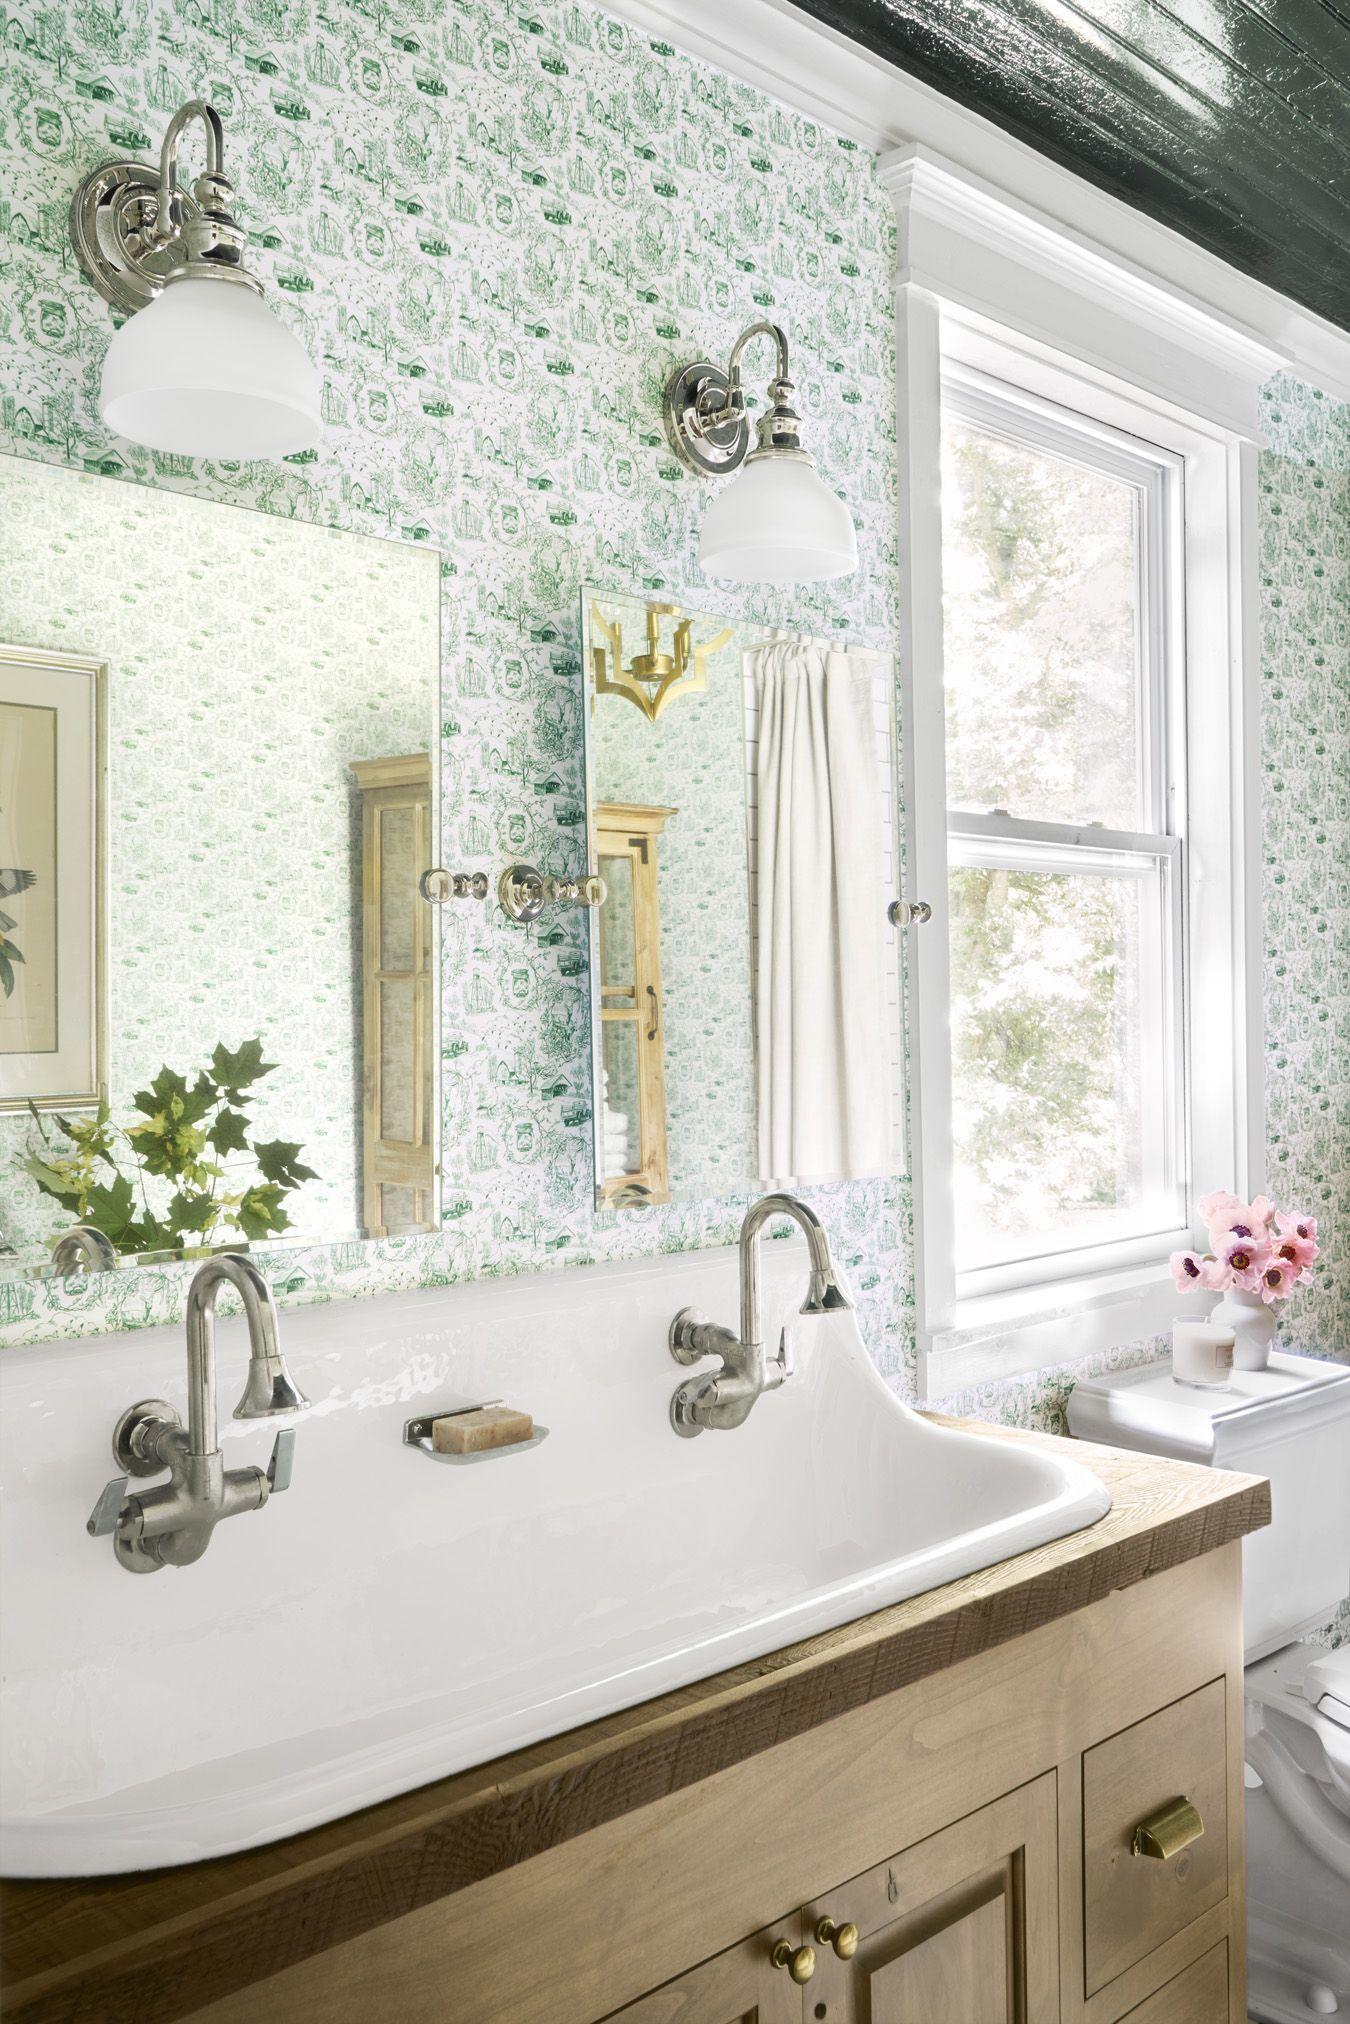 21+ Best Creative Bathroom Sink Design Ideas with Pictures ...